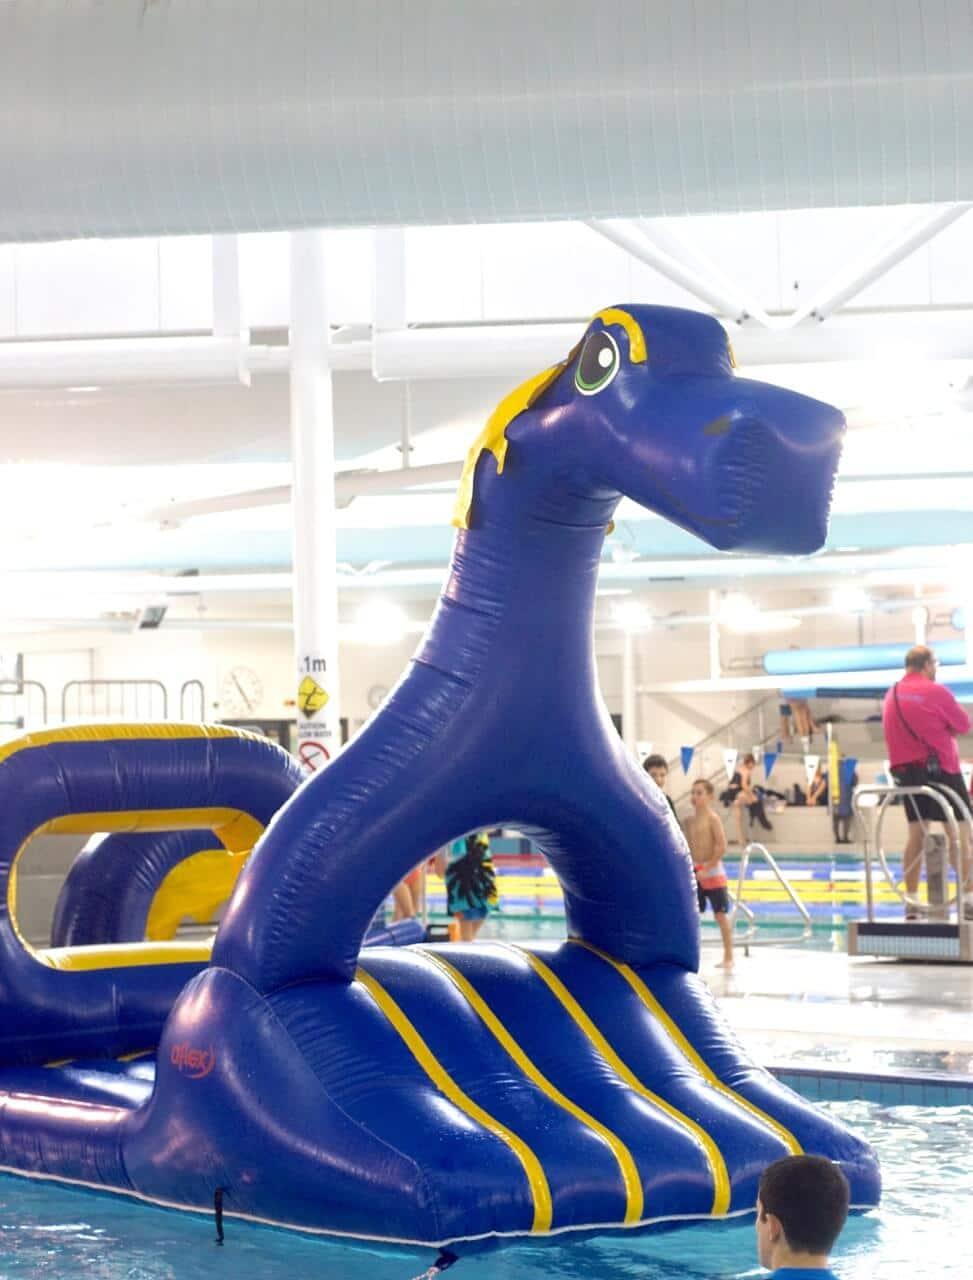 Aquapulse Aquatic Amp Leisure Centre Hoppers Crossing Review